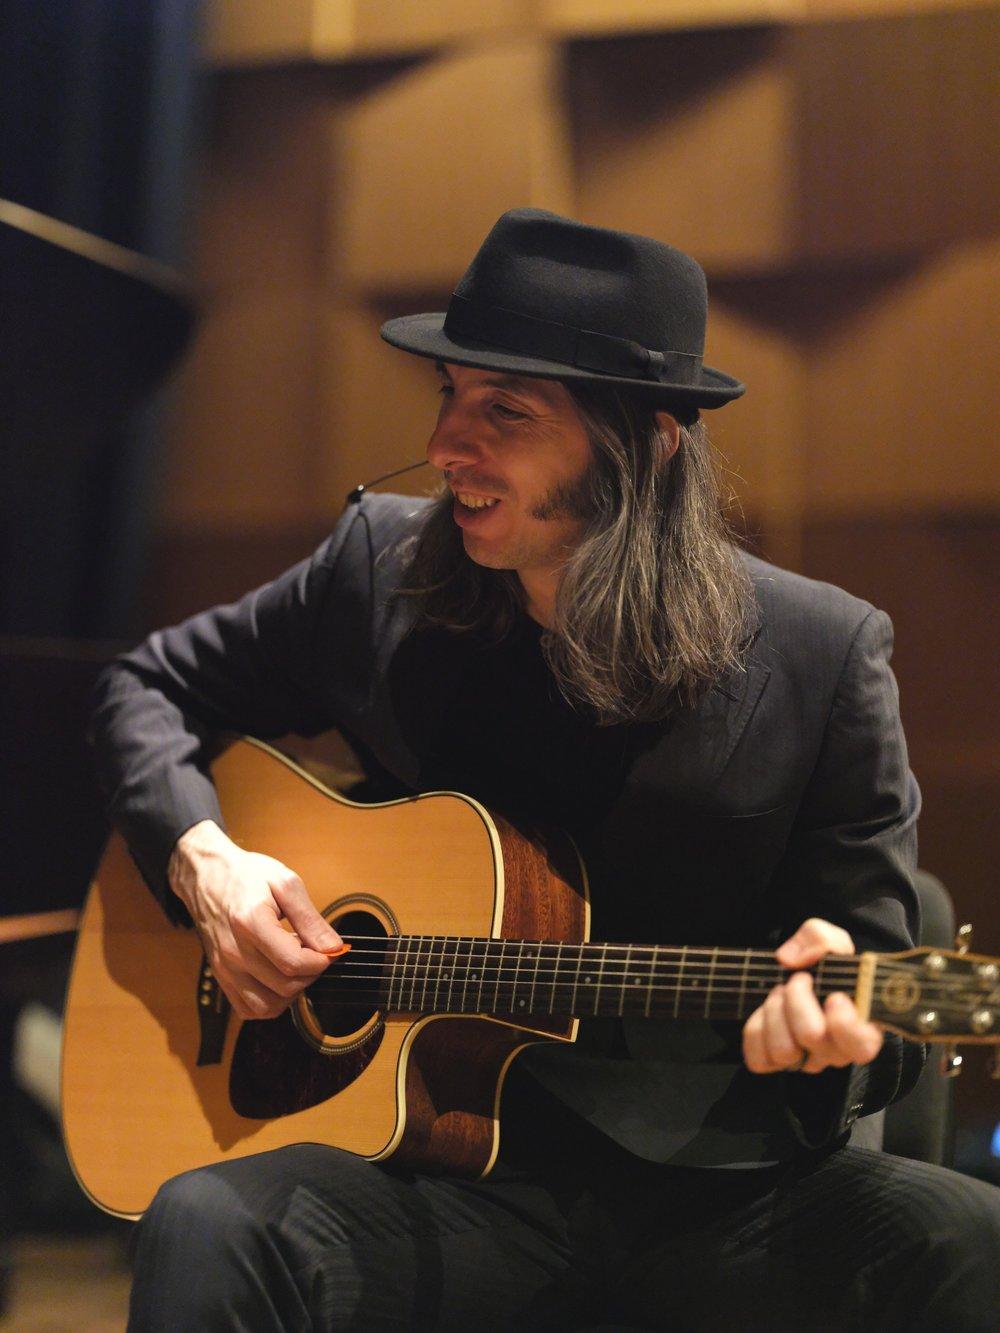 <p><strong>Sasha Markovic</strong>Co-founder, Director, Guitarist, Composer</p>